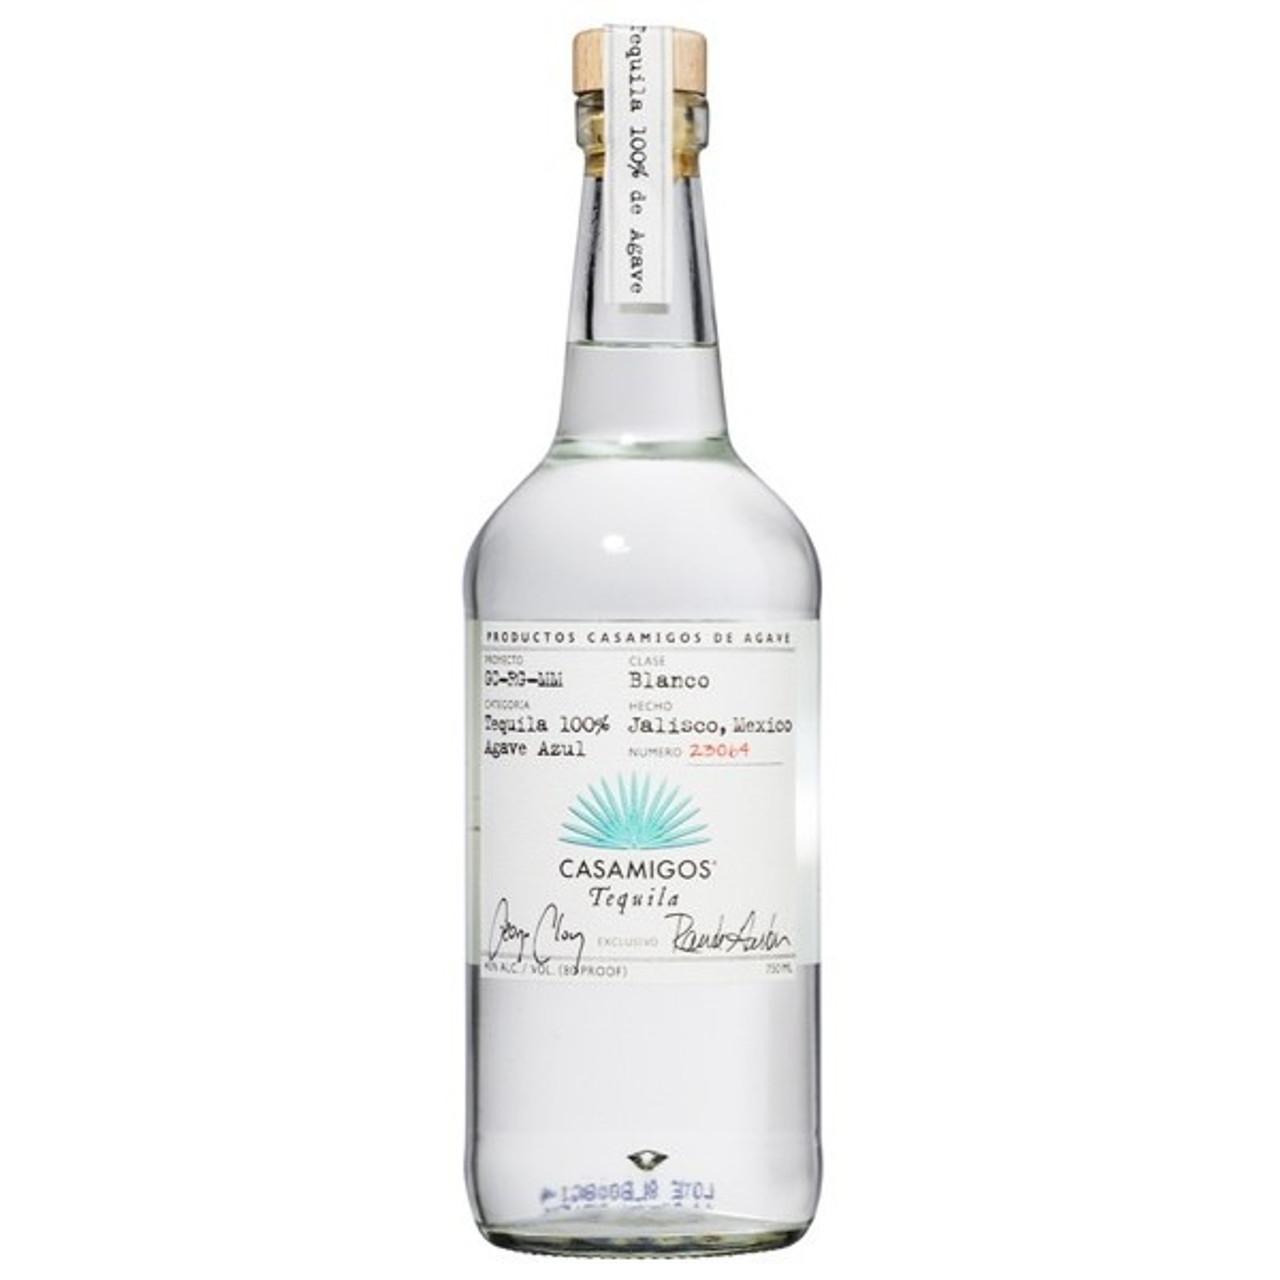 Casamigos Blanco Tequila 750ml